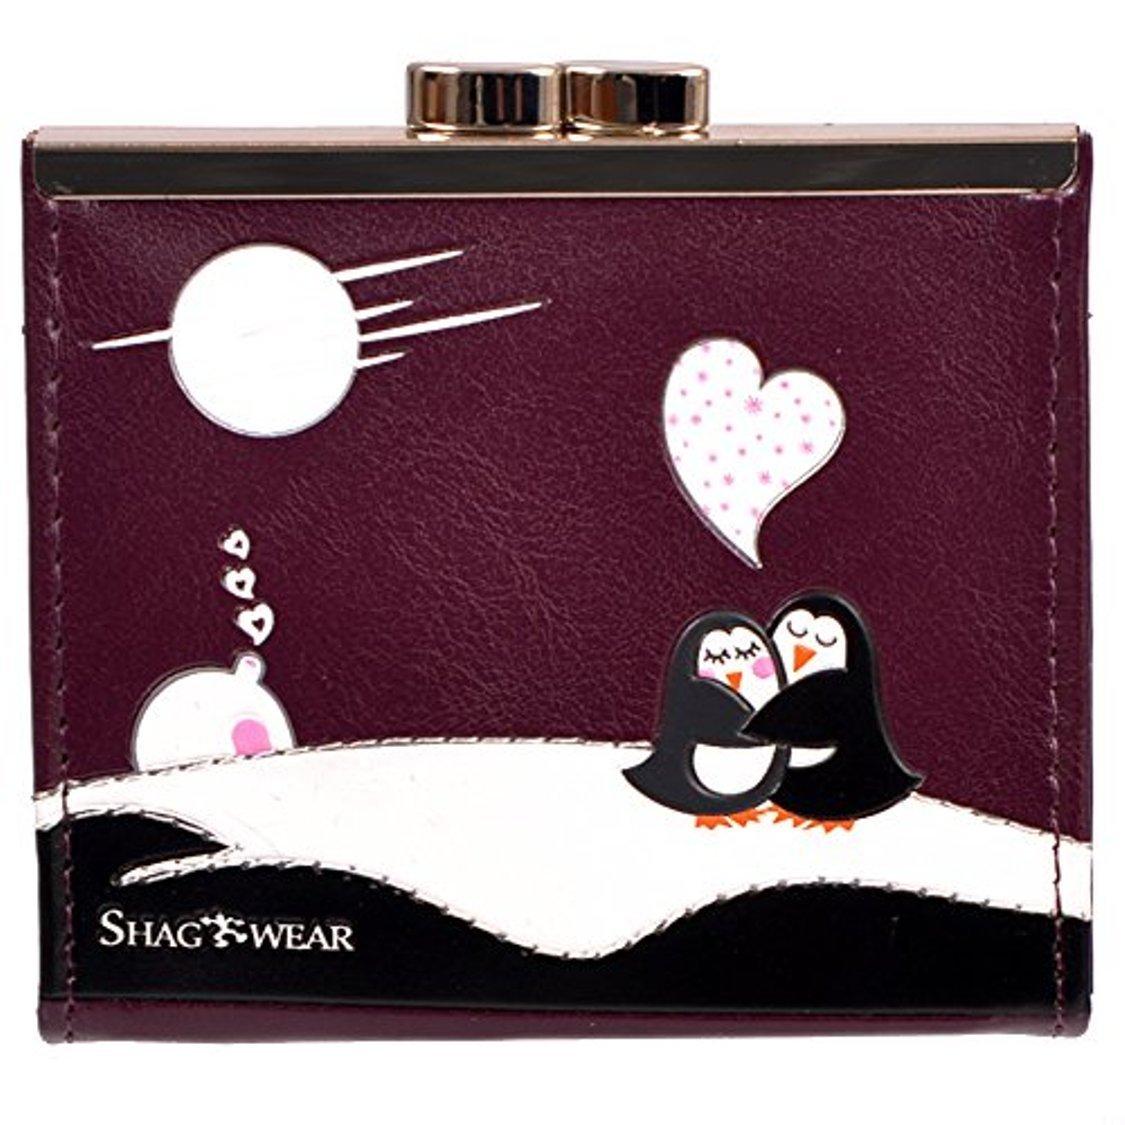 Shag Wear Women's Coin Purse Maroon Love Penguins